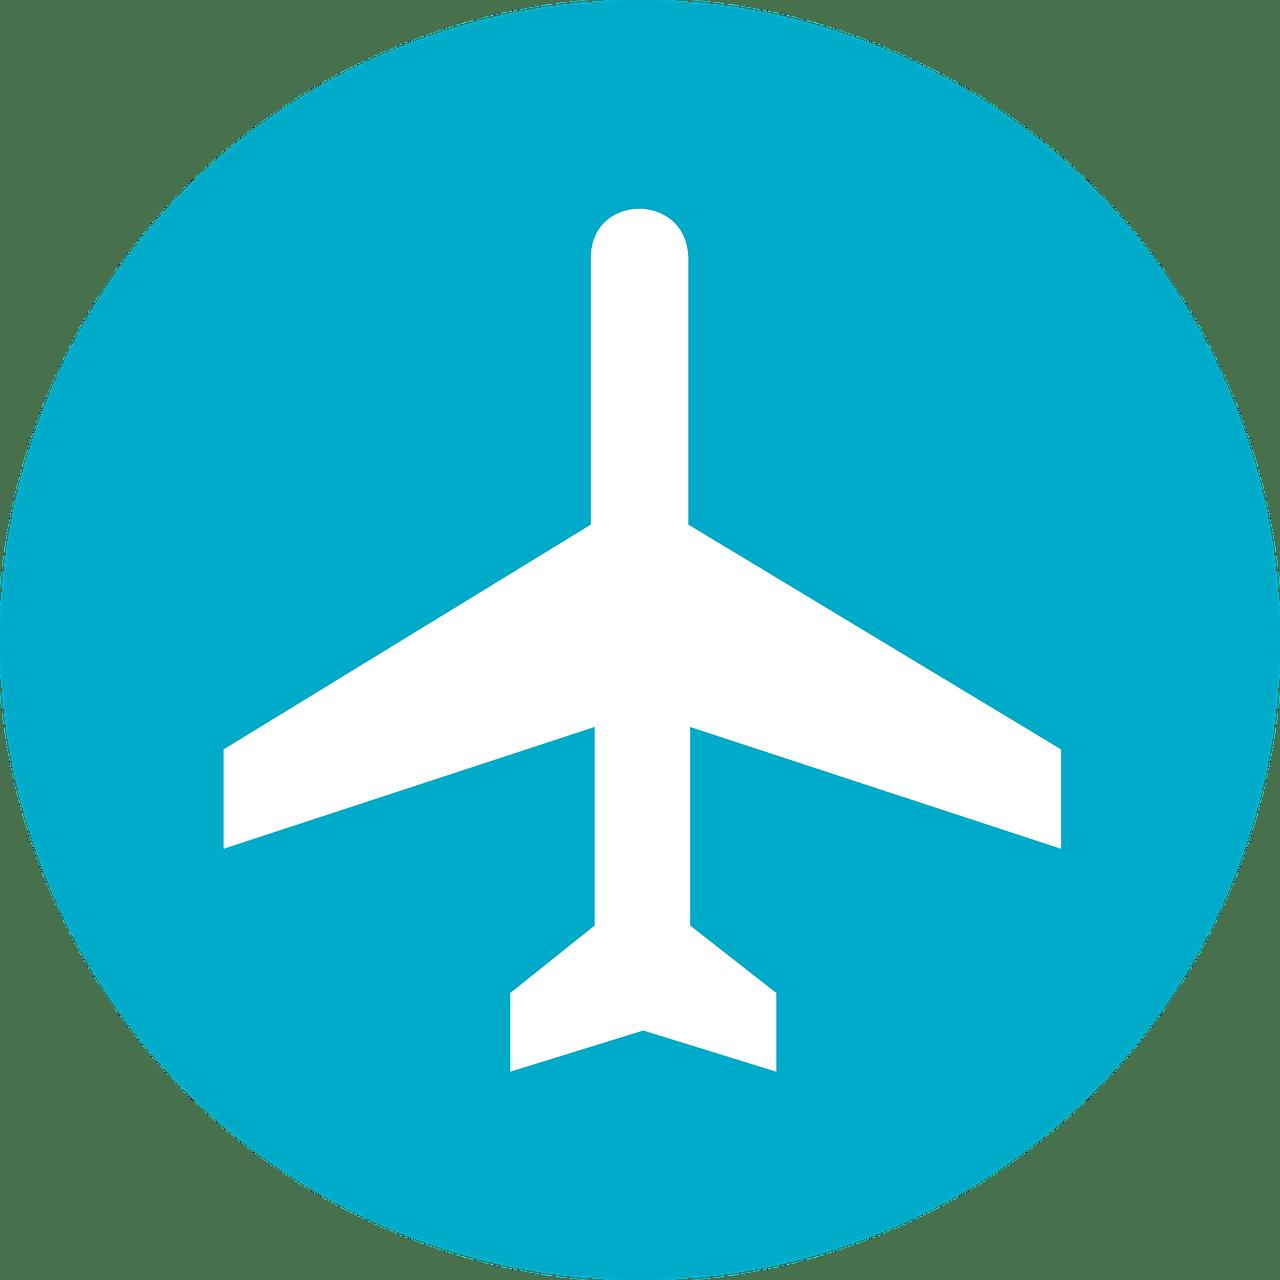 Plane symbol.